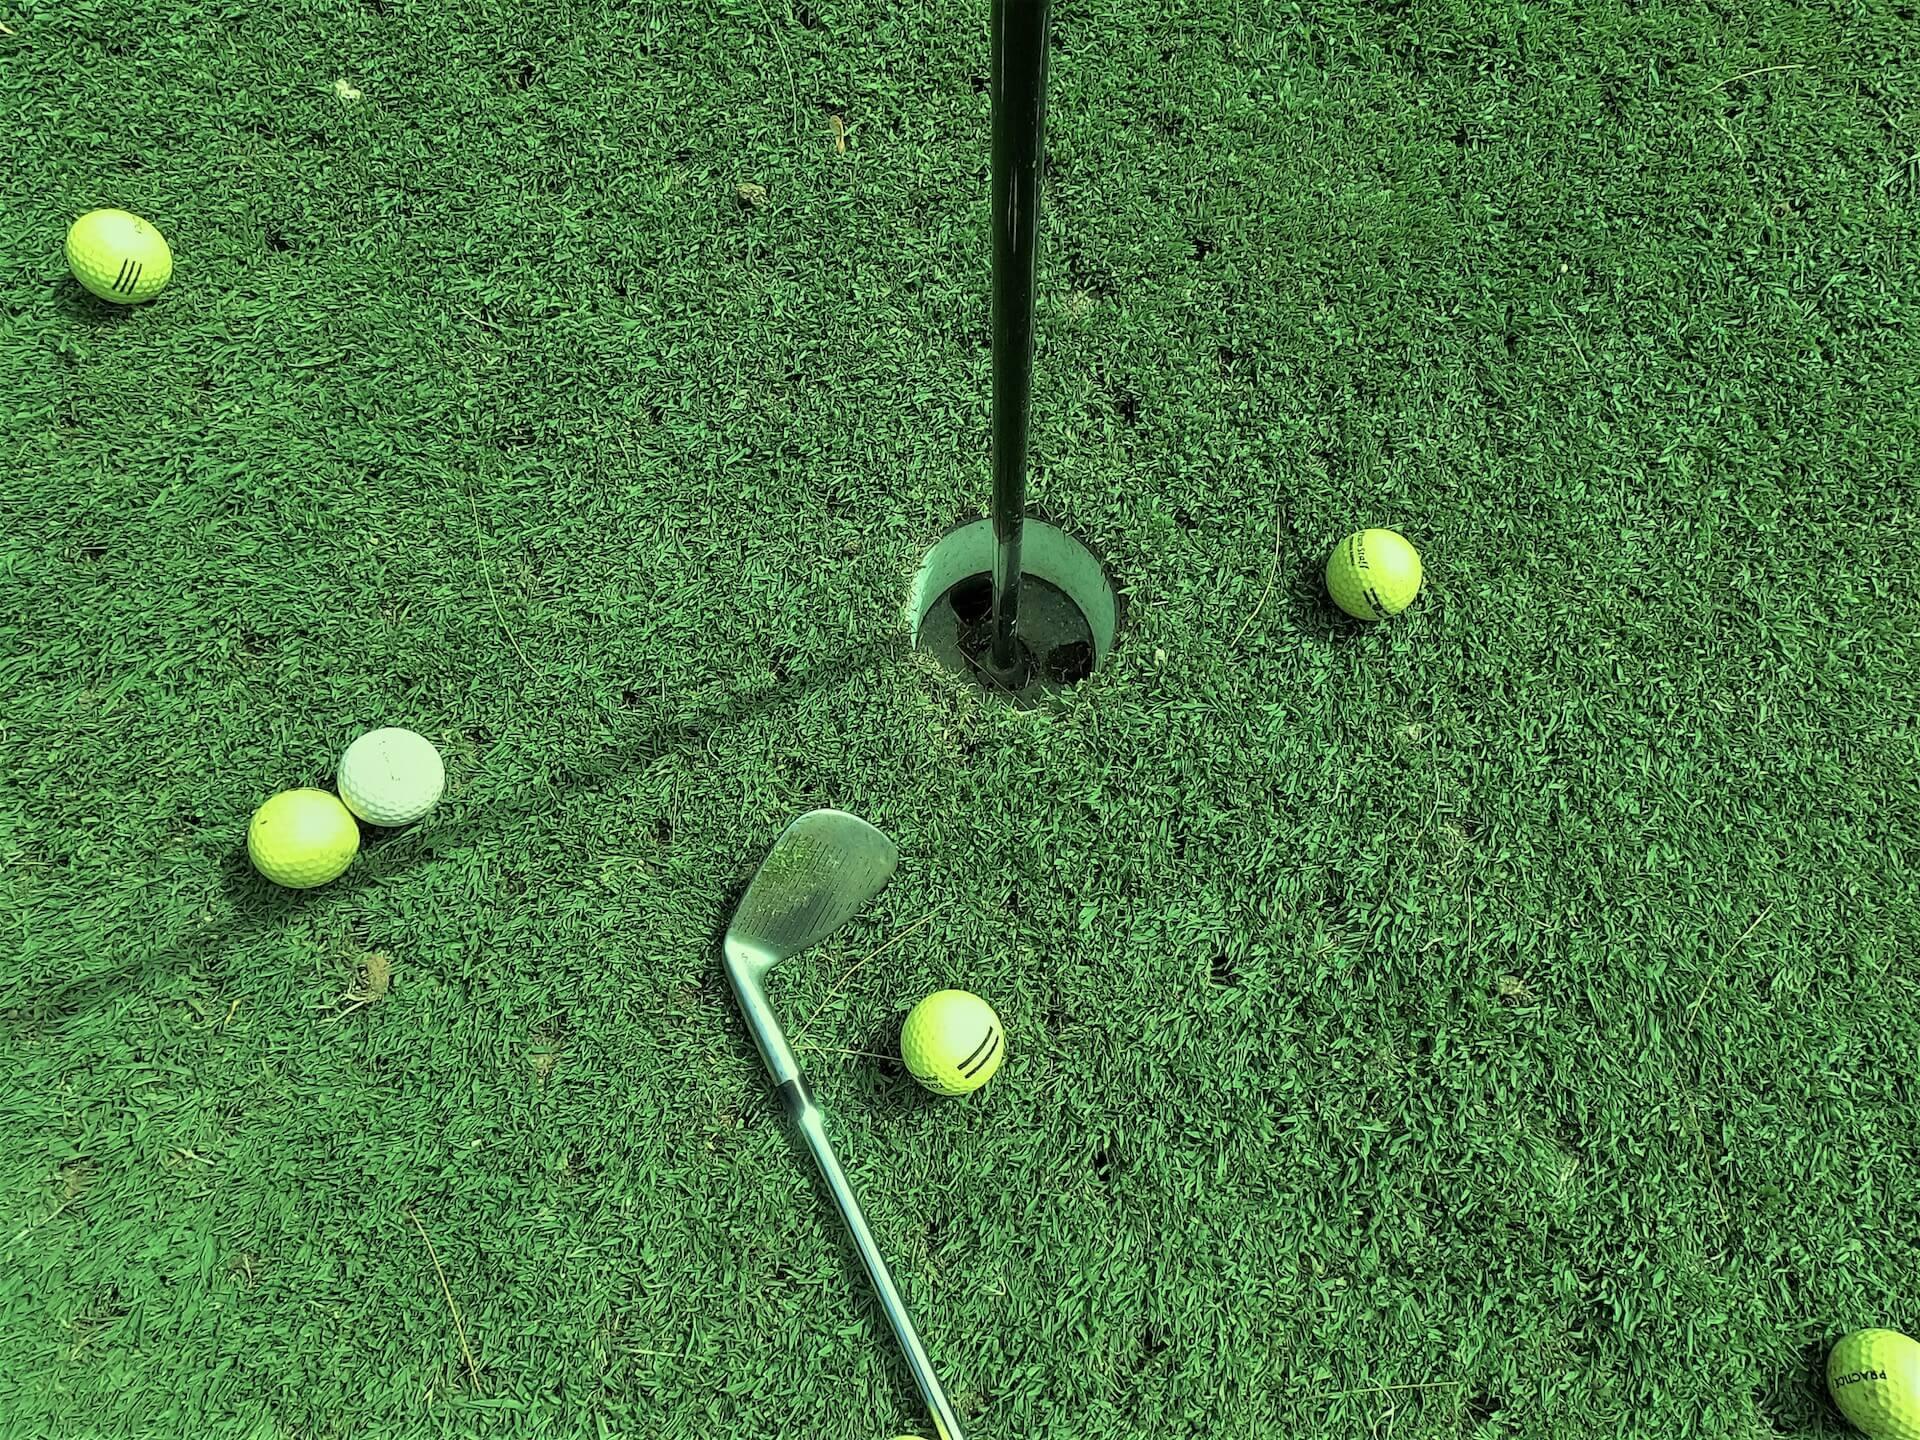 golf-hole-yellow-balls